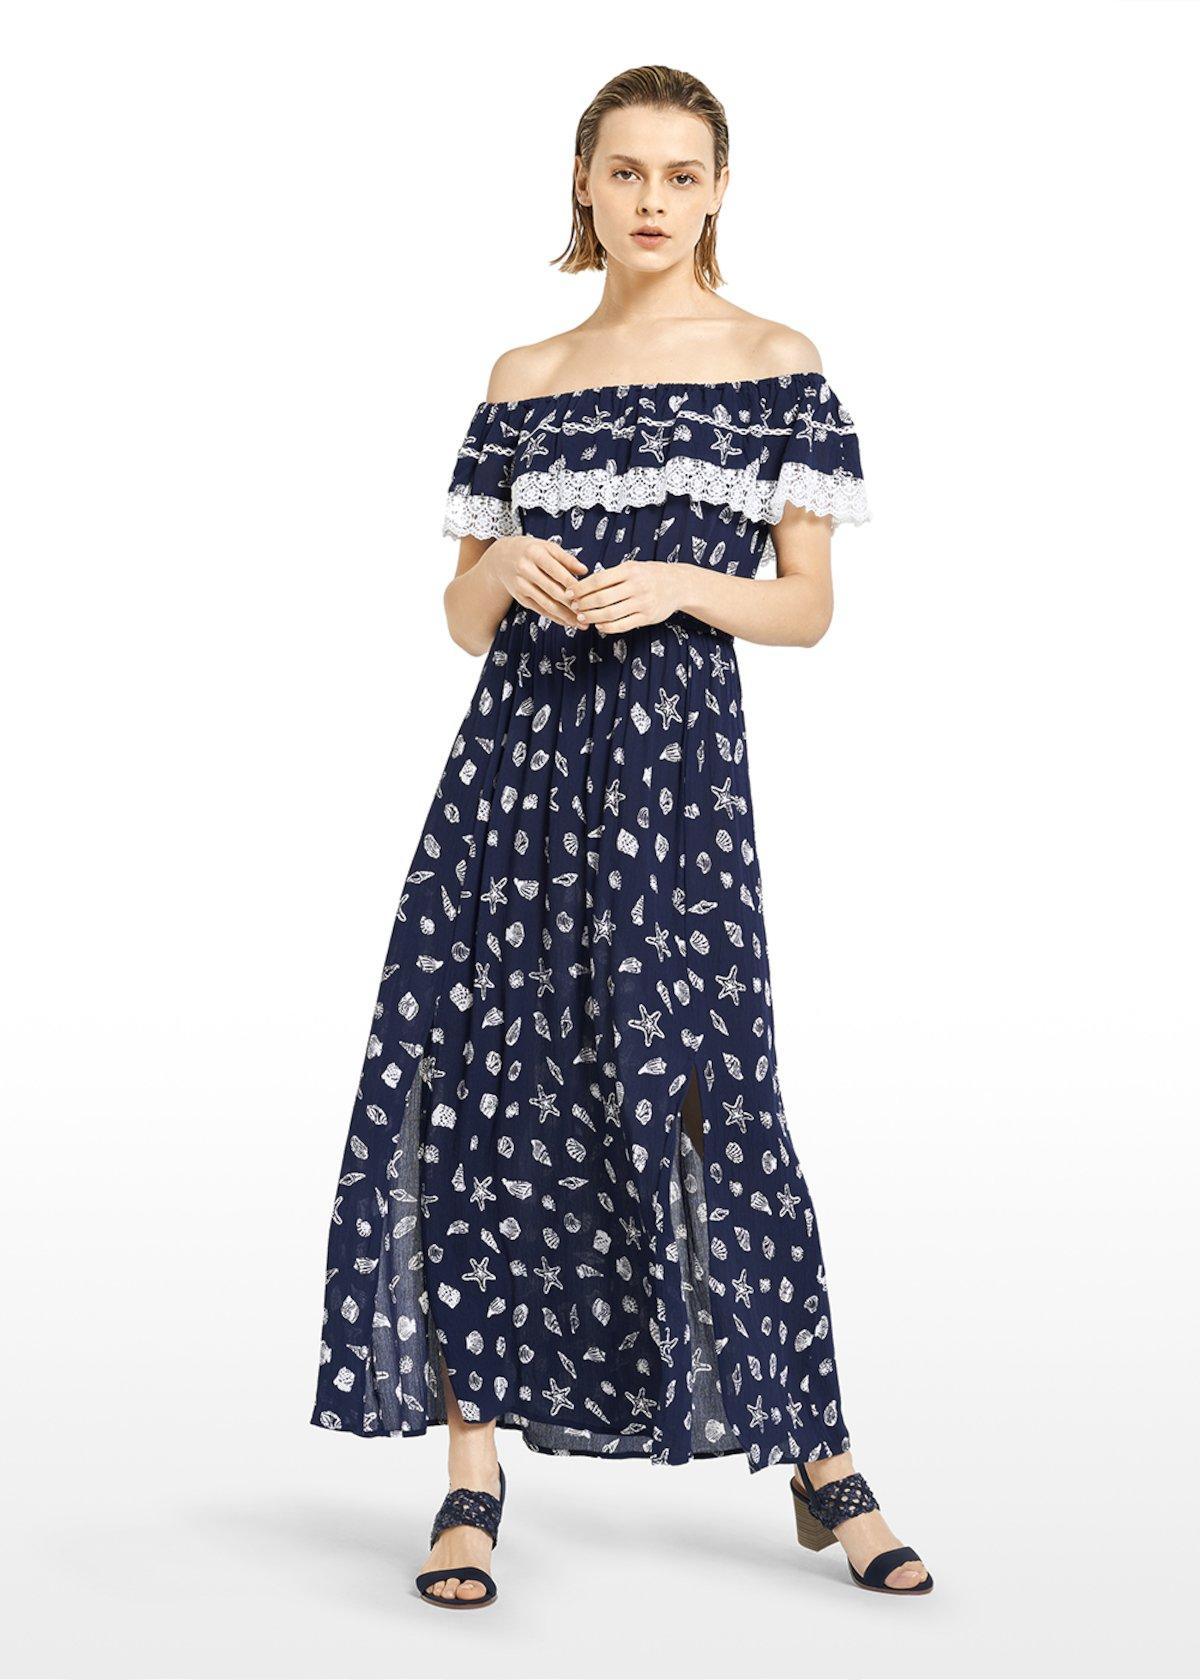 Shell print Alonso dress with elastic waist and flounce